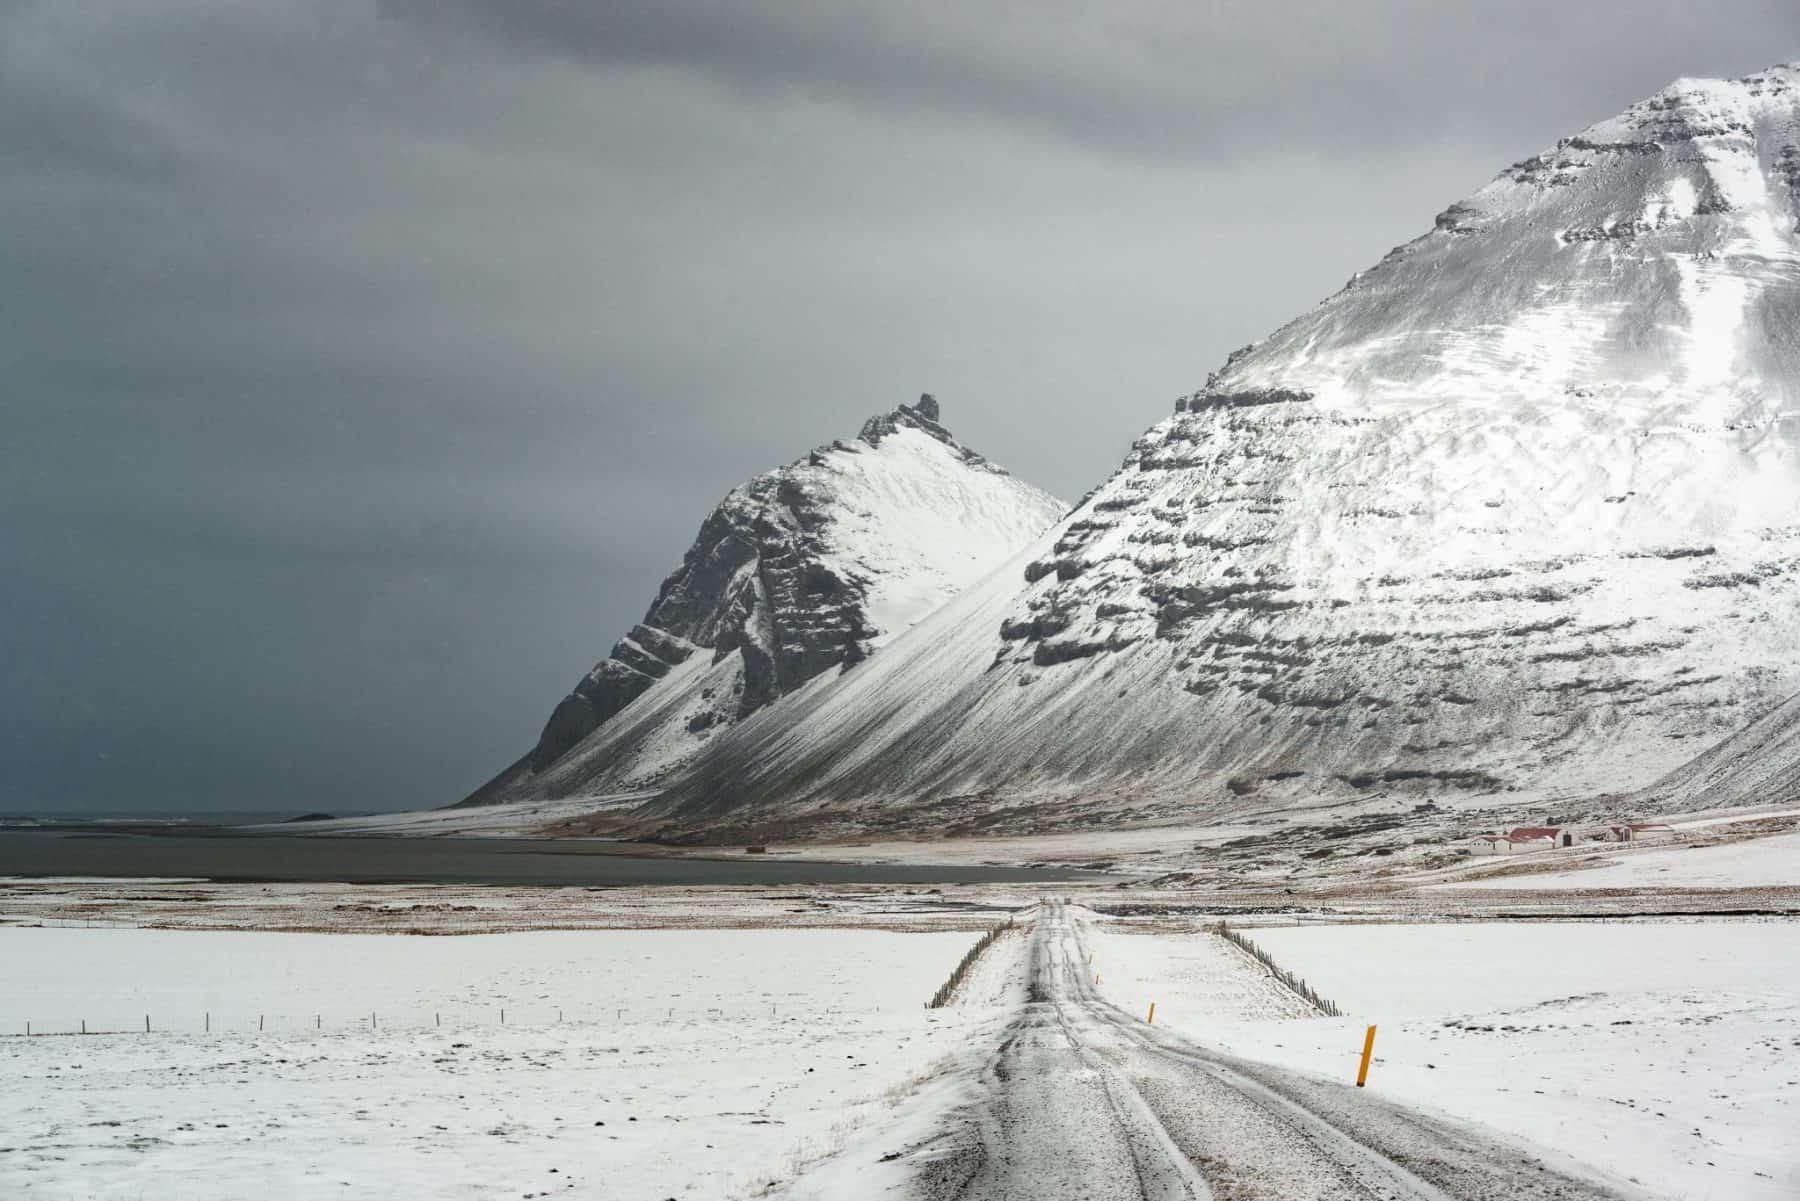 Stokksnes - Iceland photography